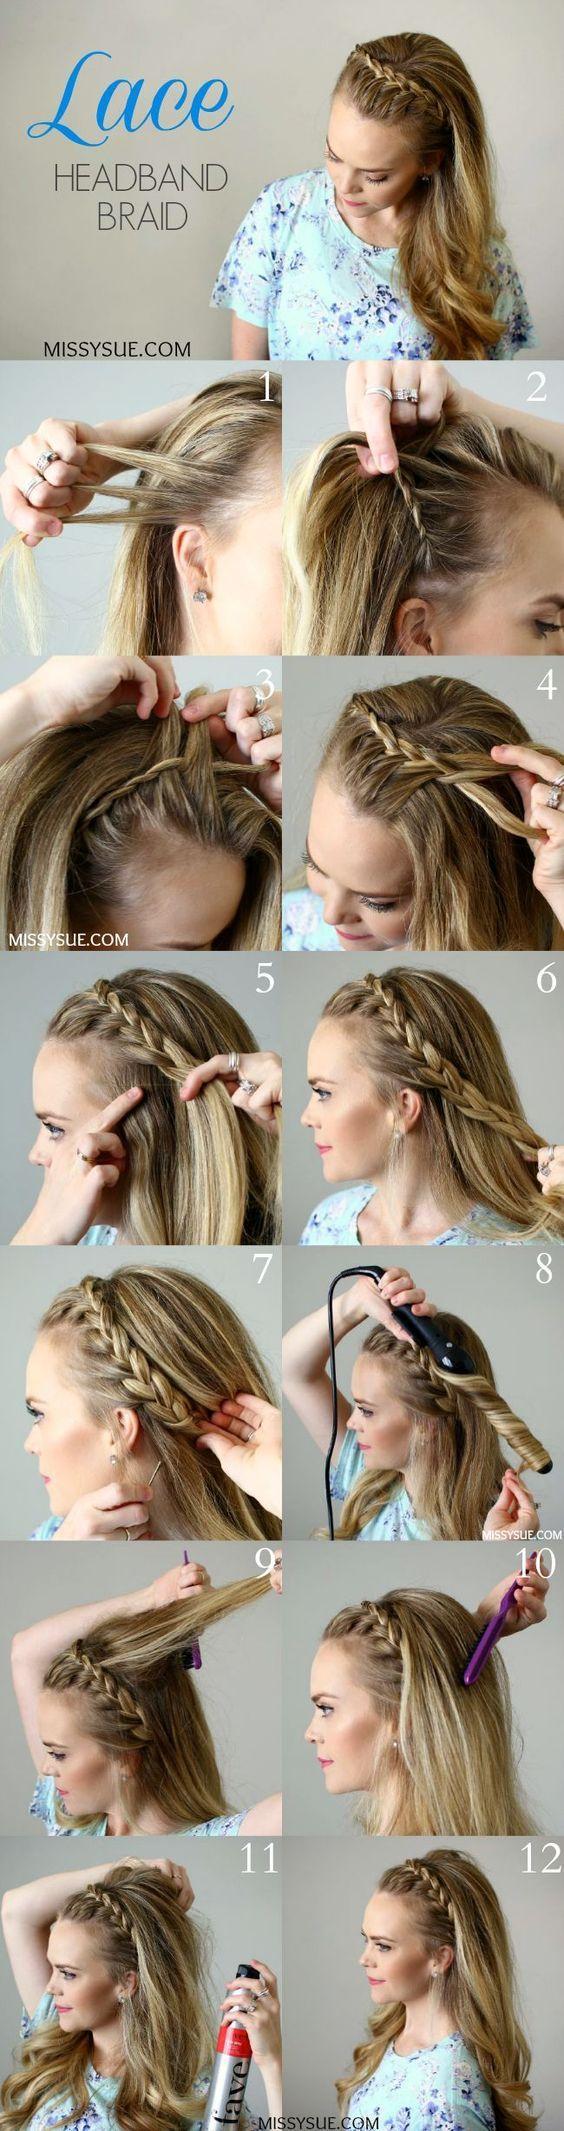 Super easy diy braided hairstyles for wedding tutorials headband